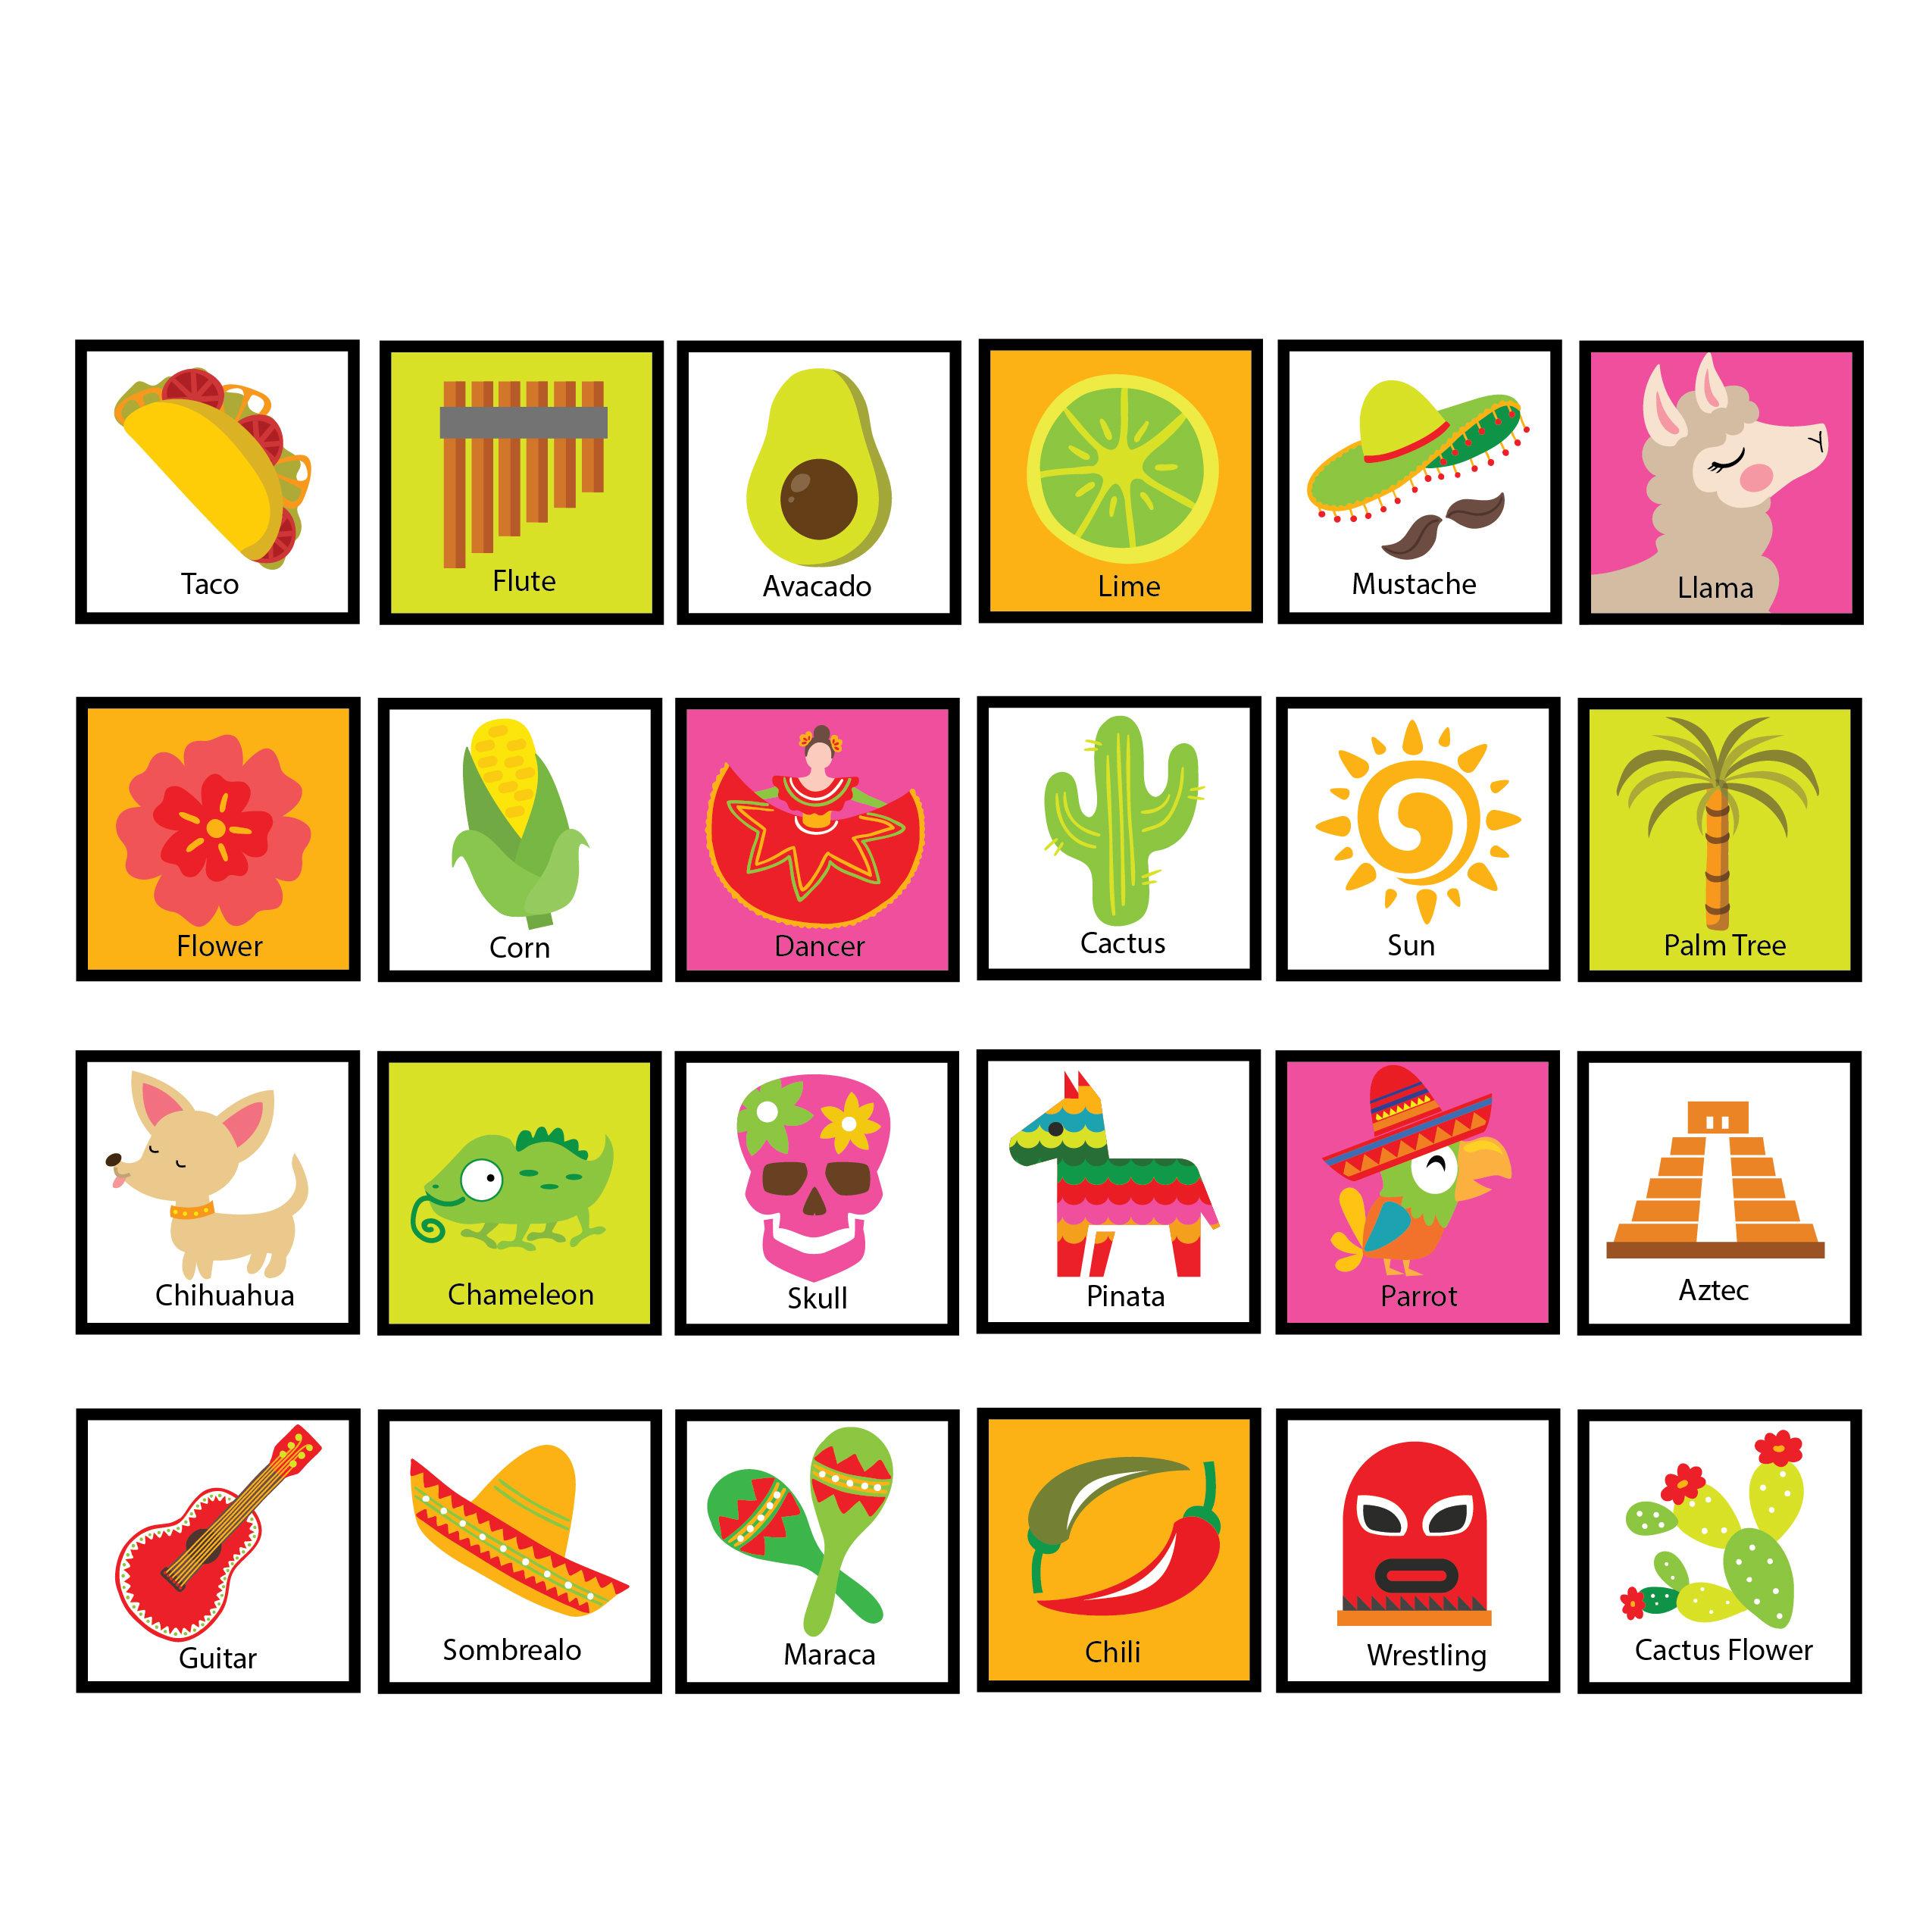 Fiesta Bingo Game - Kid's Printable Bingo Game - Bingo Game